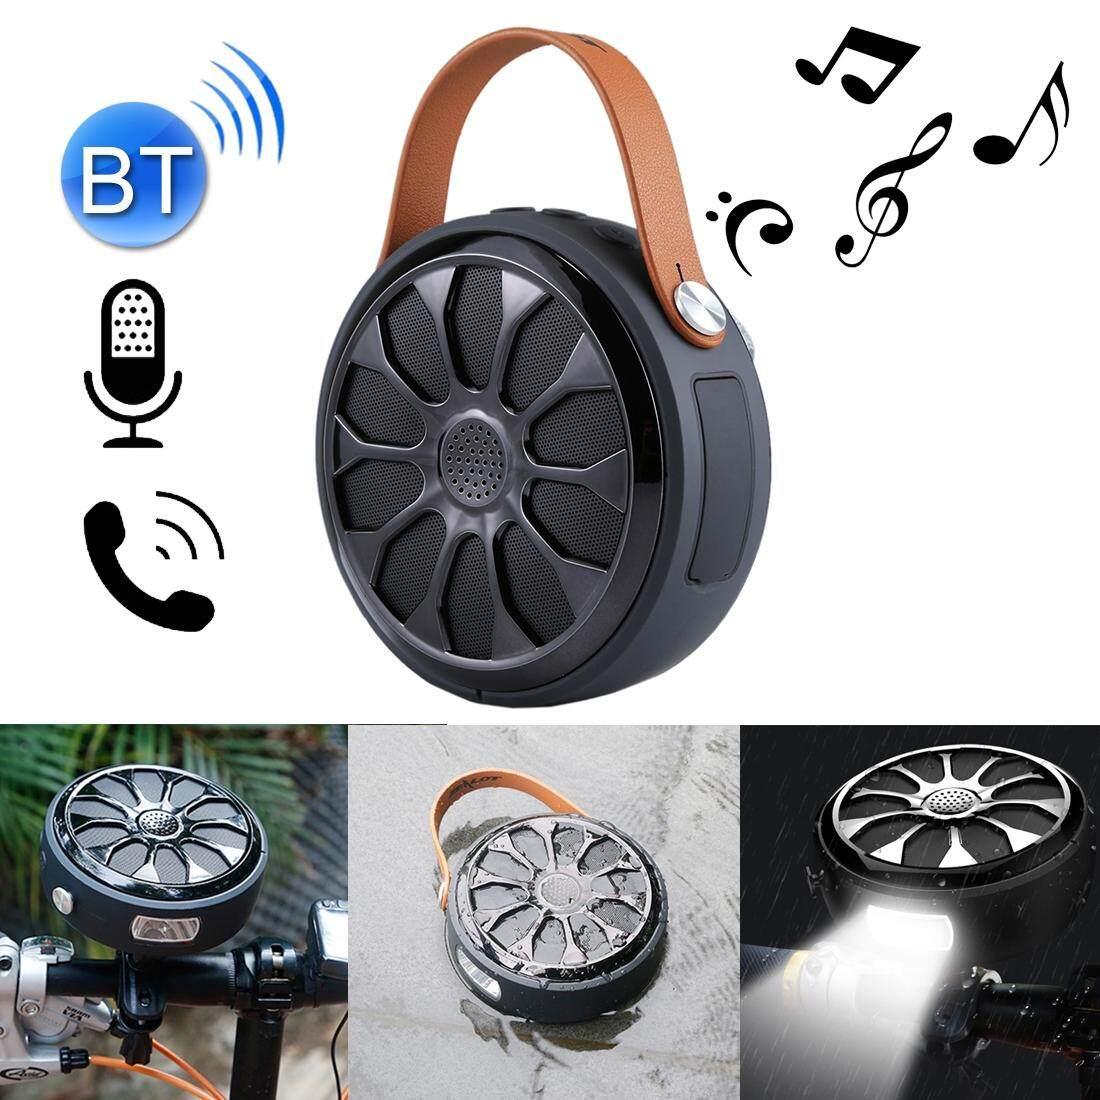 Stereo Bluetooth Speaker, Dukungan Jawab/Tutup/Tolak Panggilan & Kartu Tf dan Fungsi Senter, untuk iPhone, Galaxy, Sony, Lenovo HTC, Huawei, Google LG Xiaomi, Earphone Smartphone